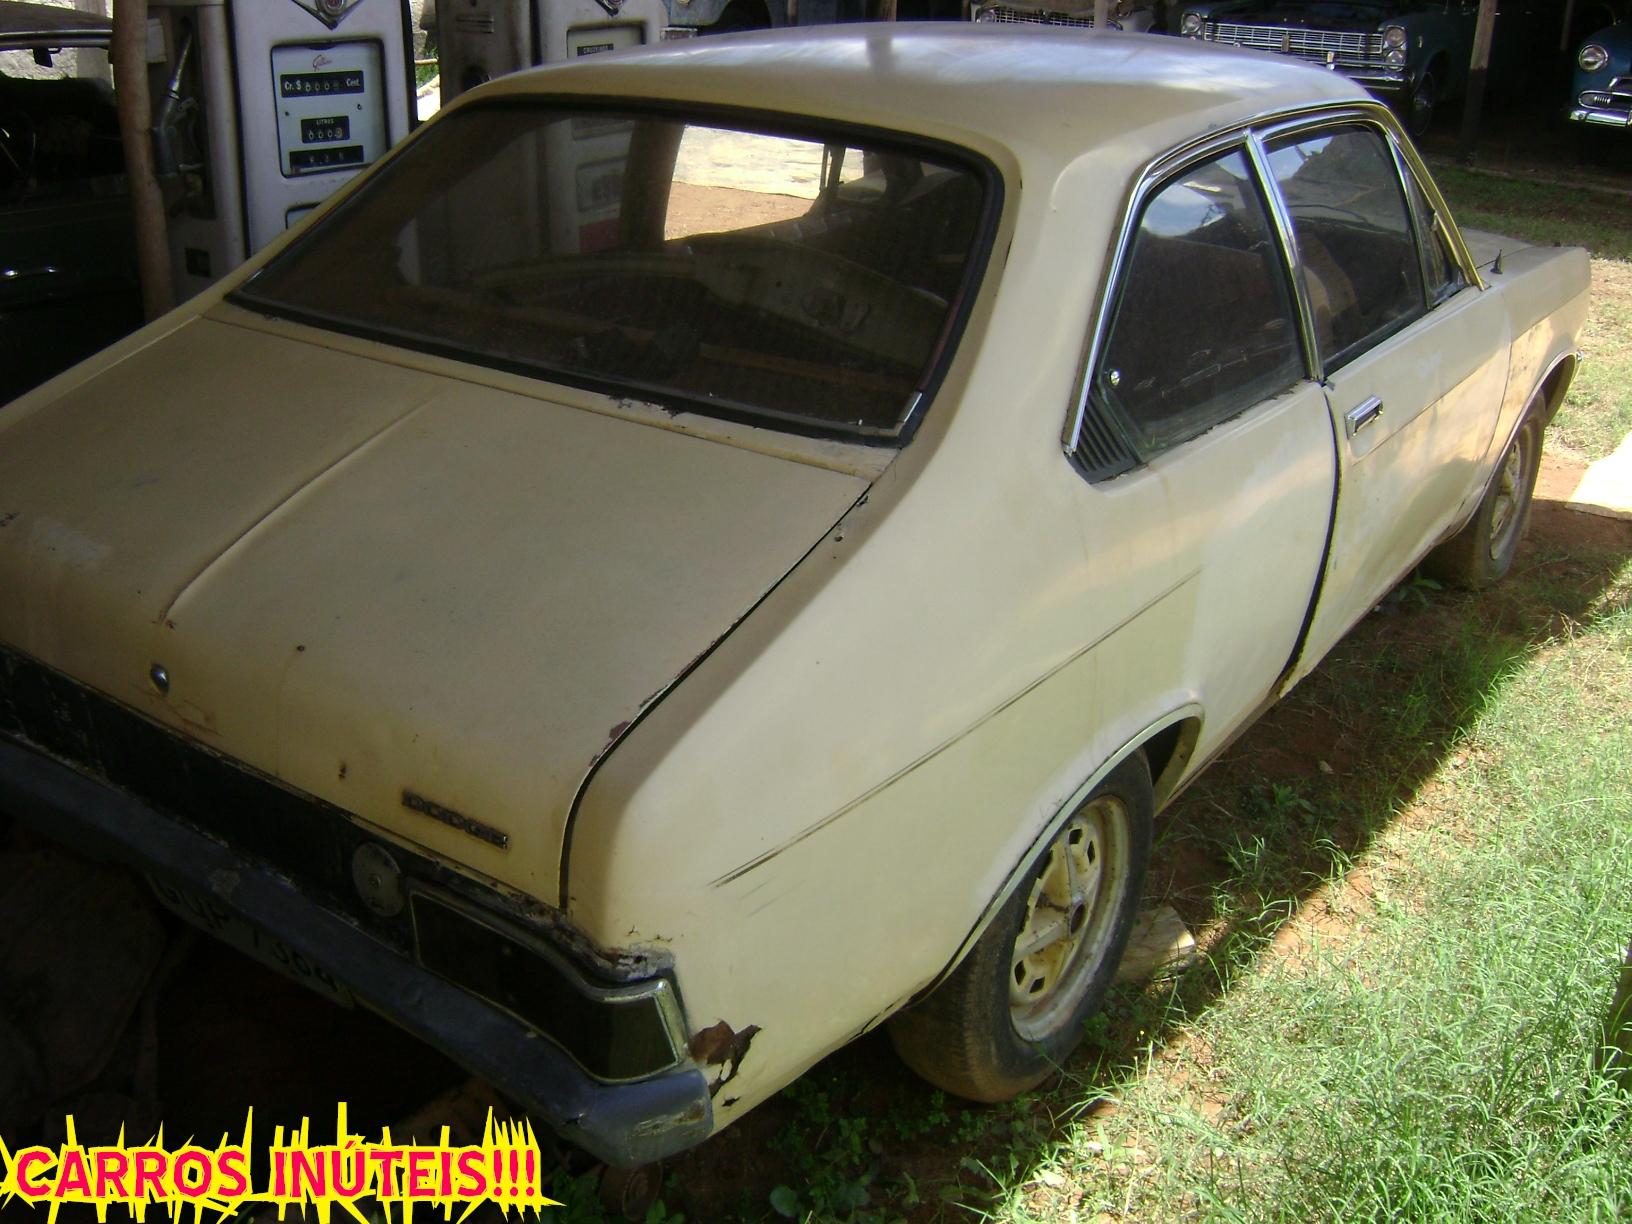 guilherme-gomes-polara-mg-traseira Dodge Polara GL 1977 à venda!